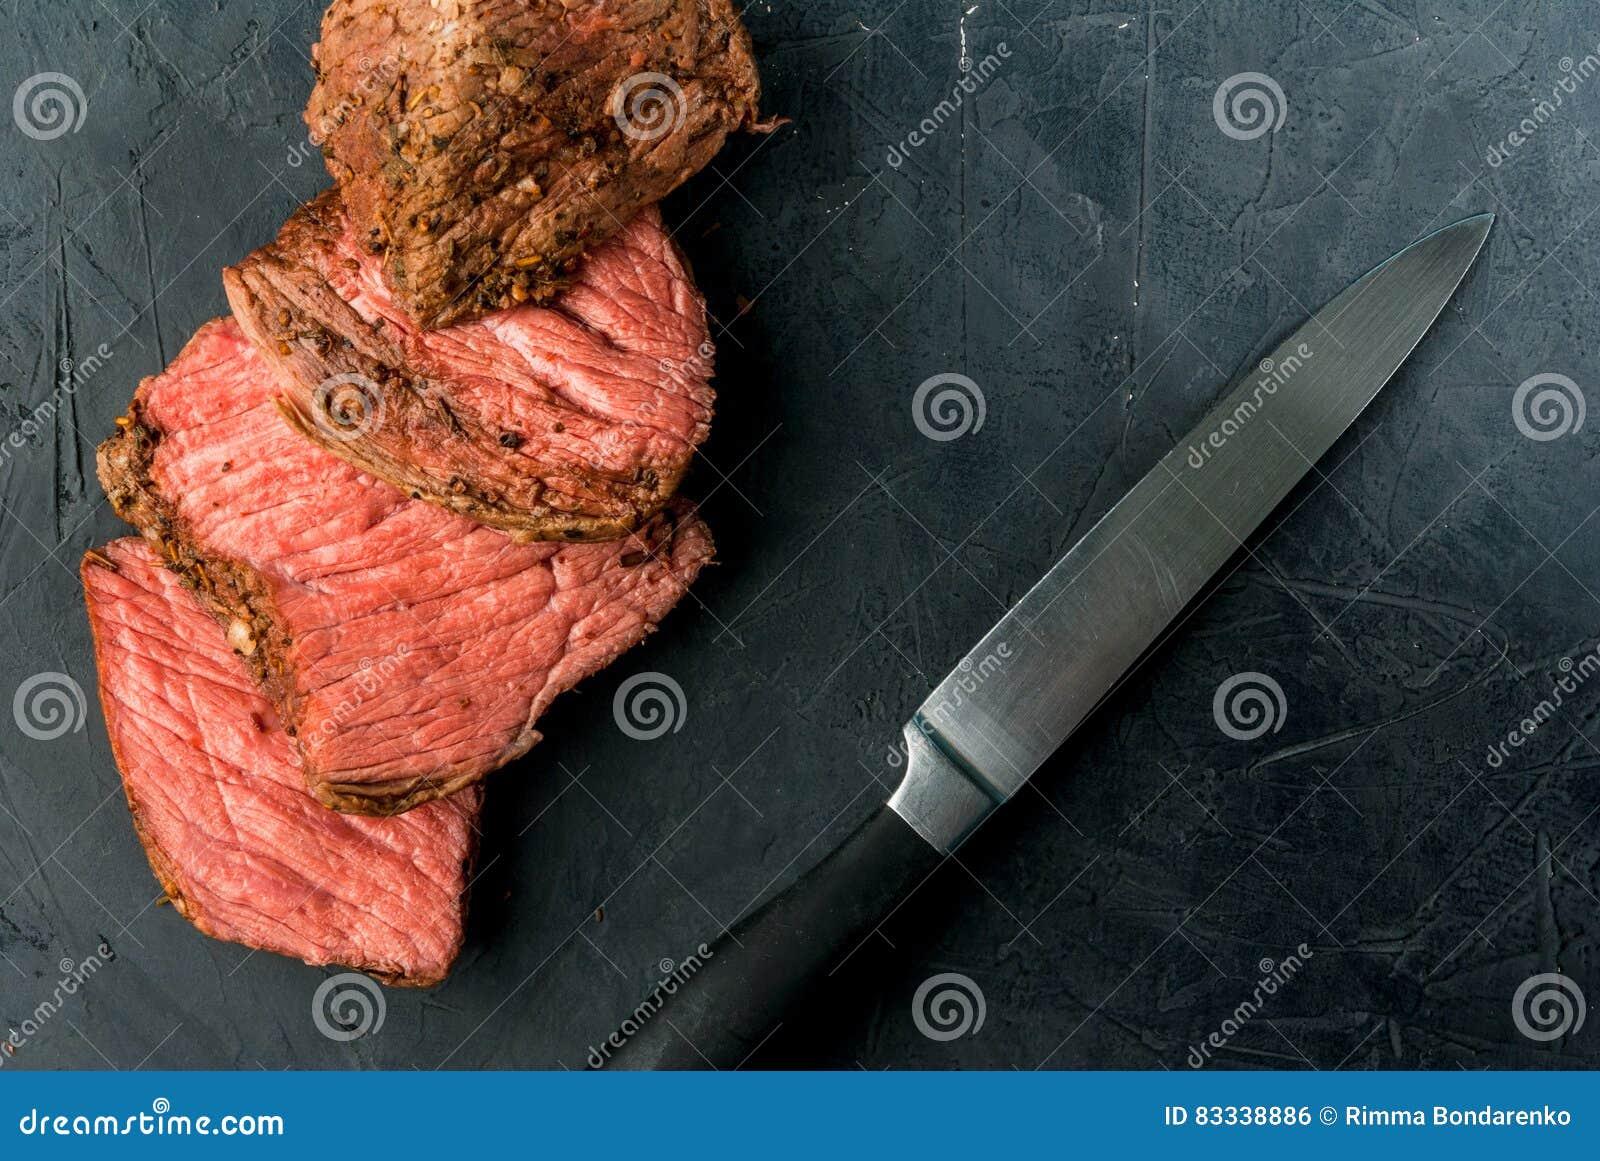 Sous -sous-vide rundvleeslapje vlees